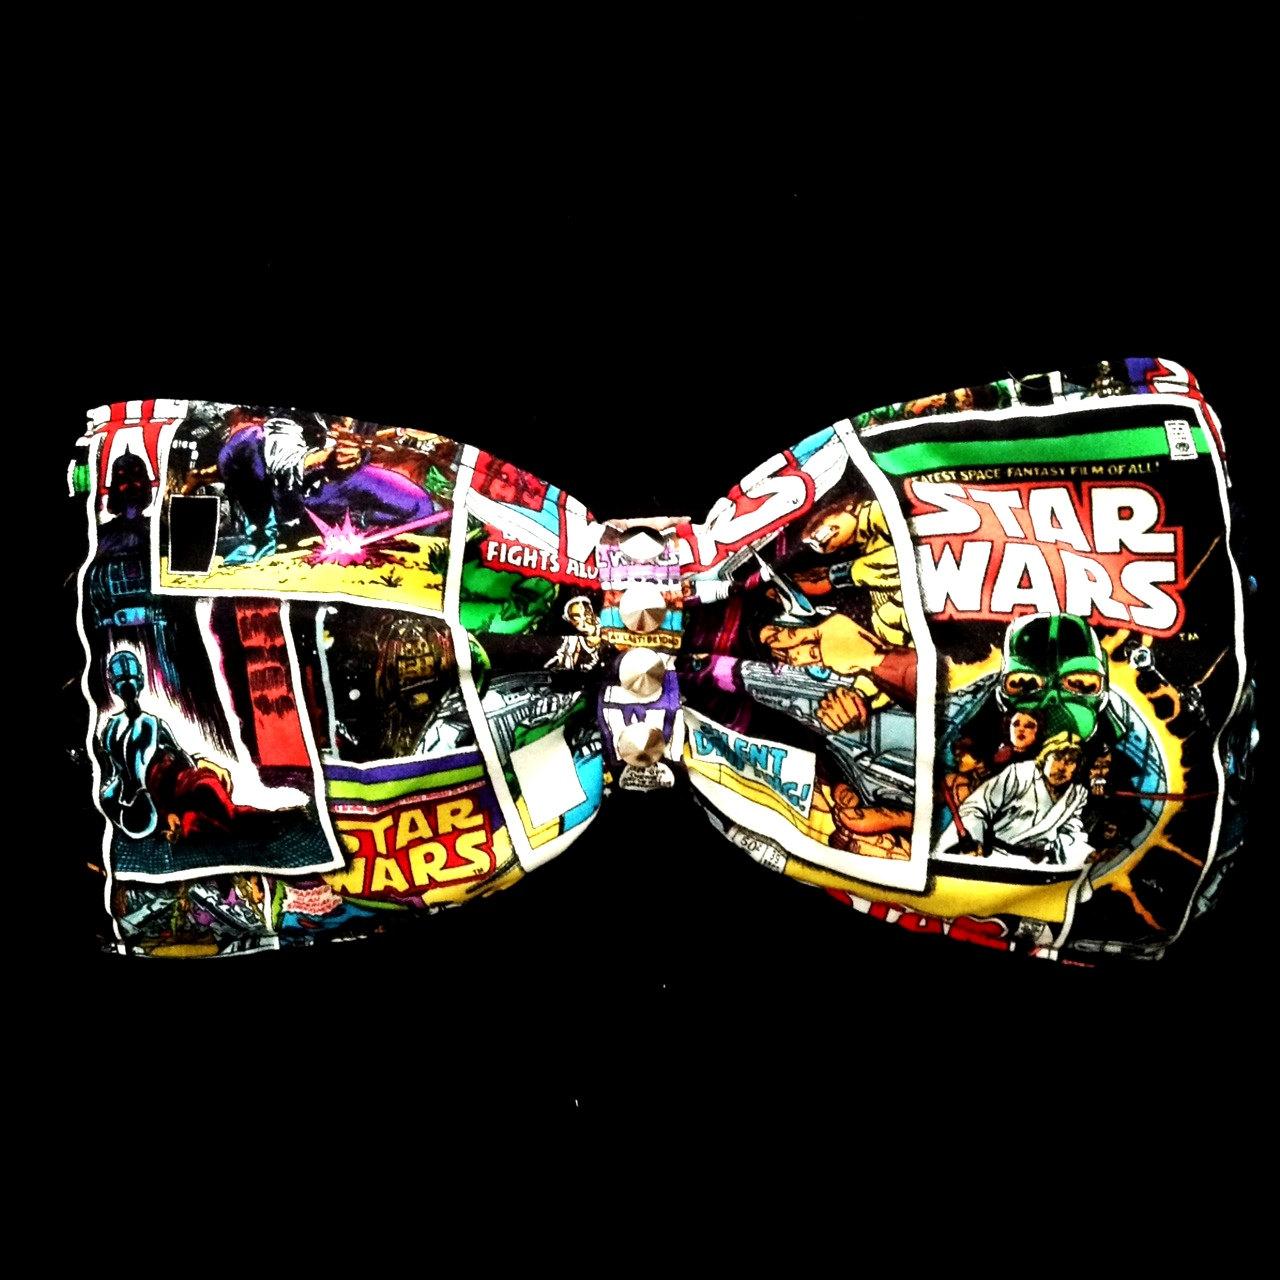 Star wars bandeau top